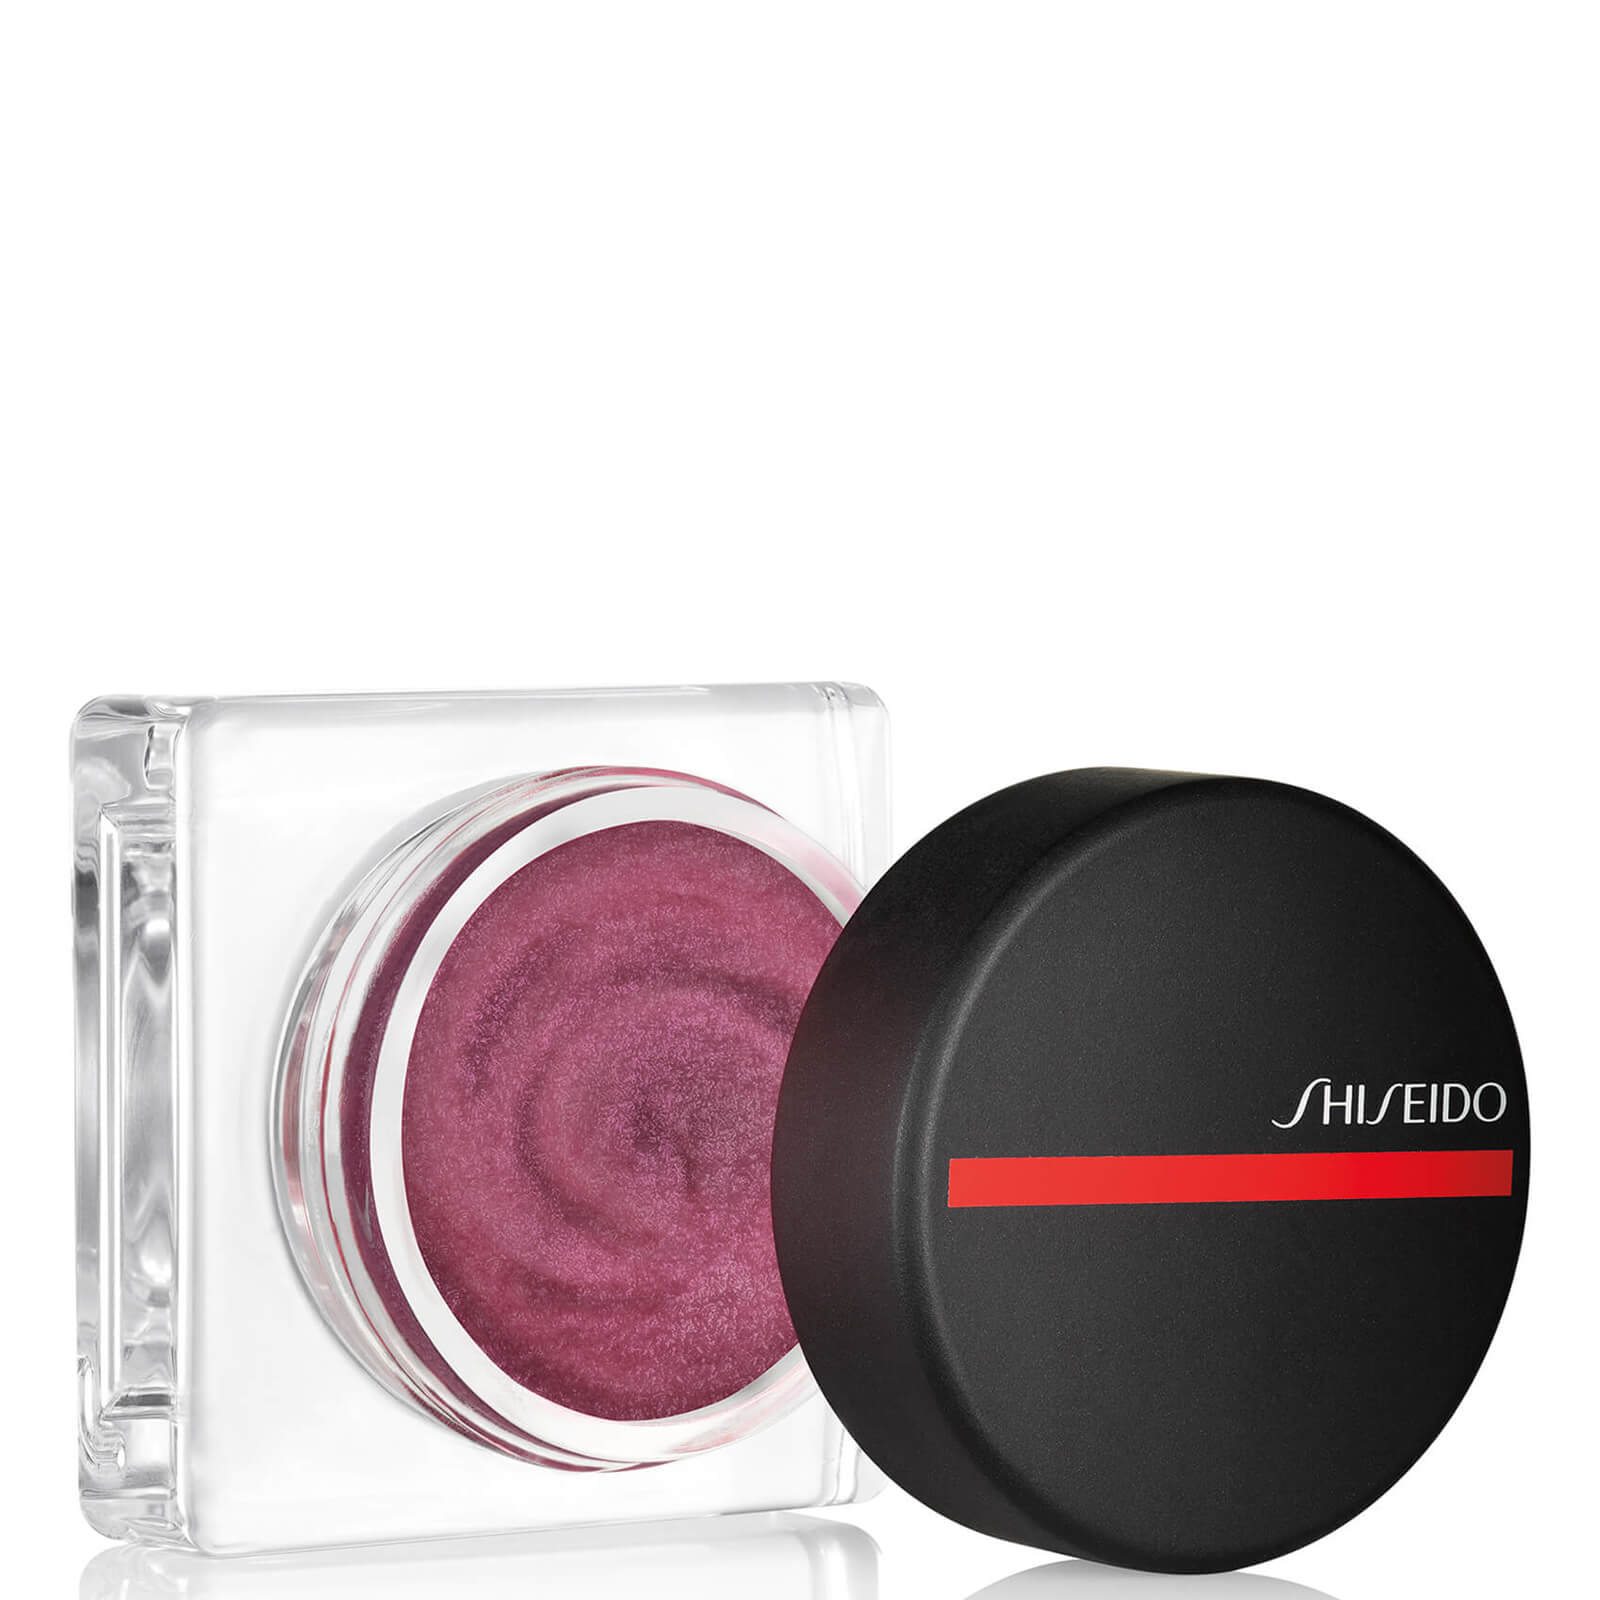 Купить Румяна-вуаль Shiseido Minimalist Whipped Powder Blush (различные оттенки) - Blush Ayao 05